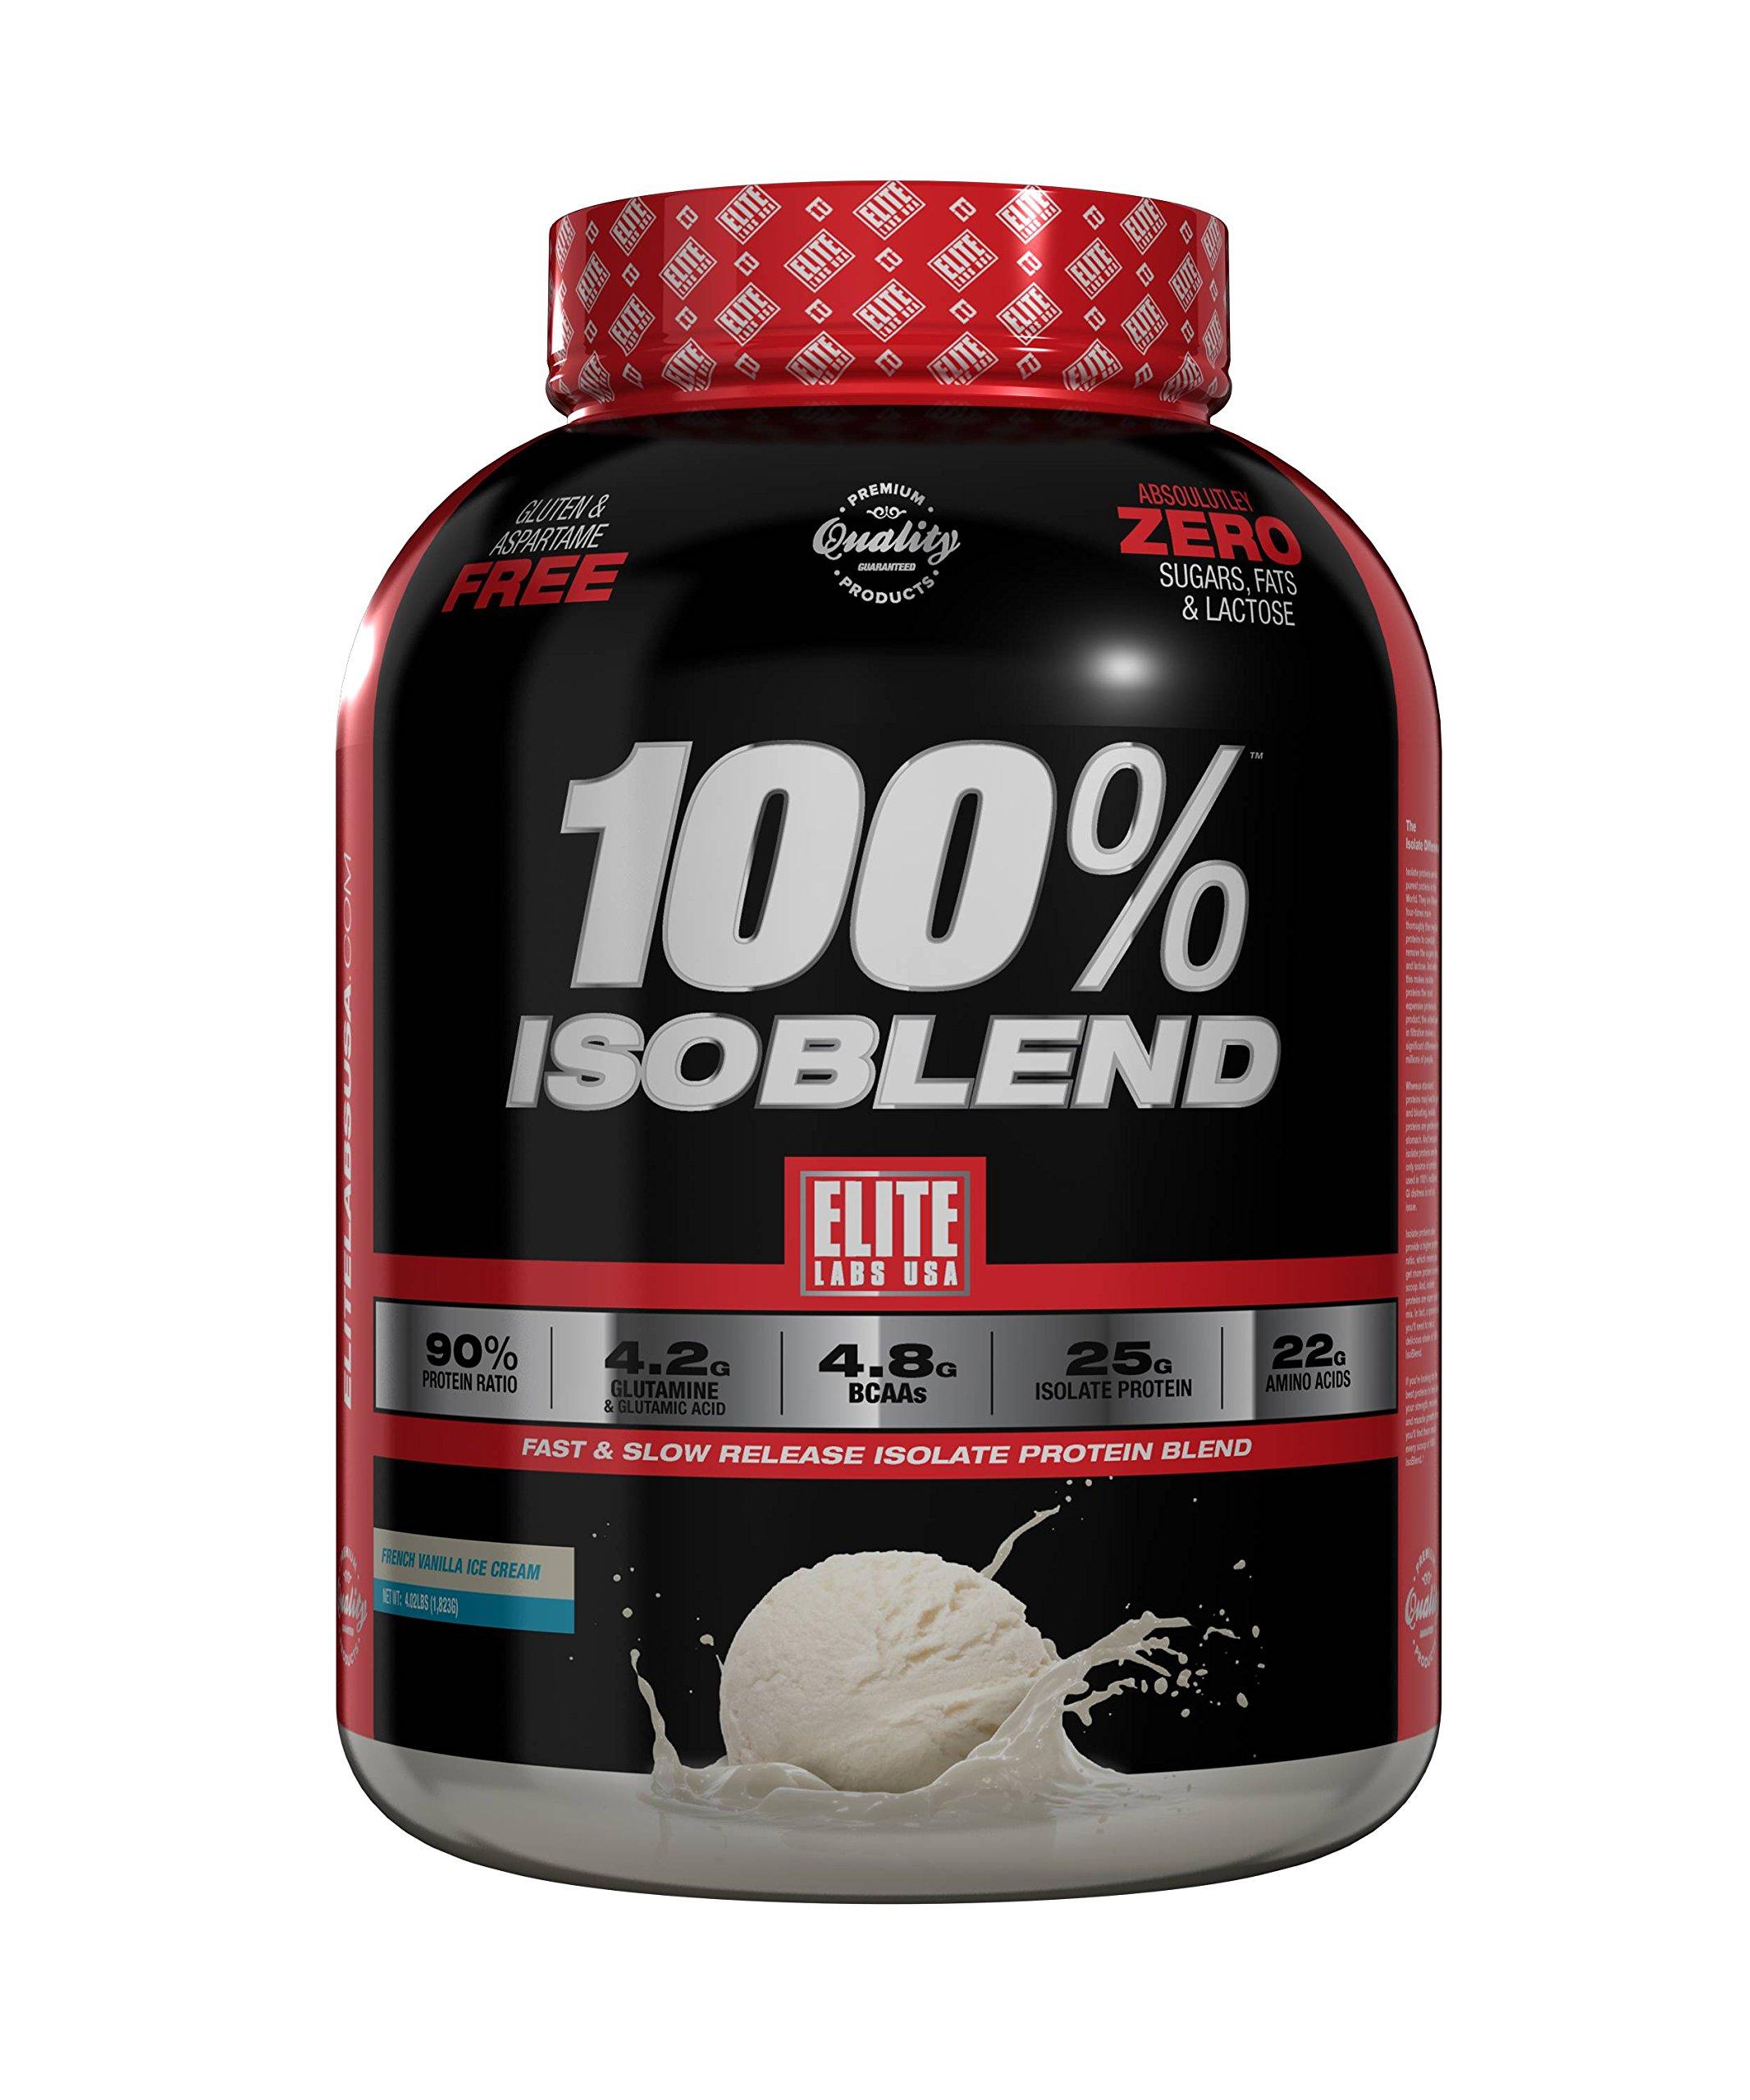 Elite Labs USA 100% ISOBLEND 4.02 LBS, FRENCH VANILLA ICE CREAM